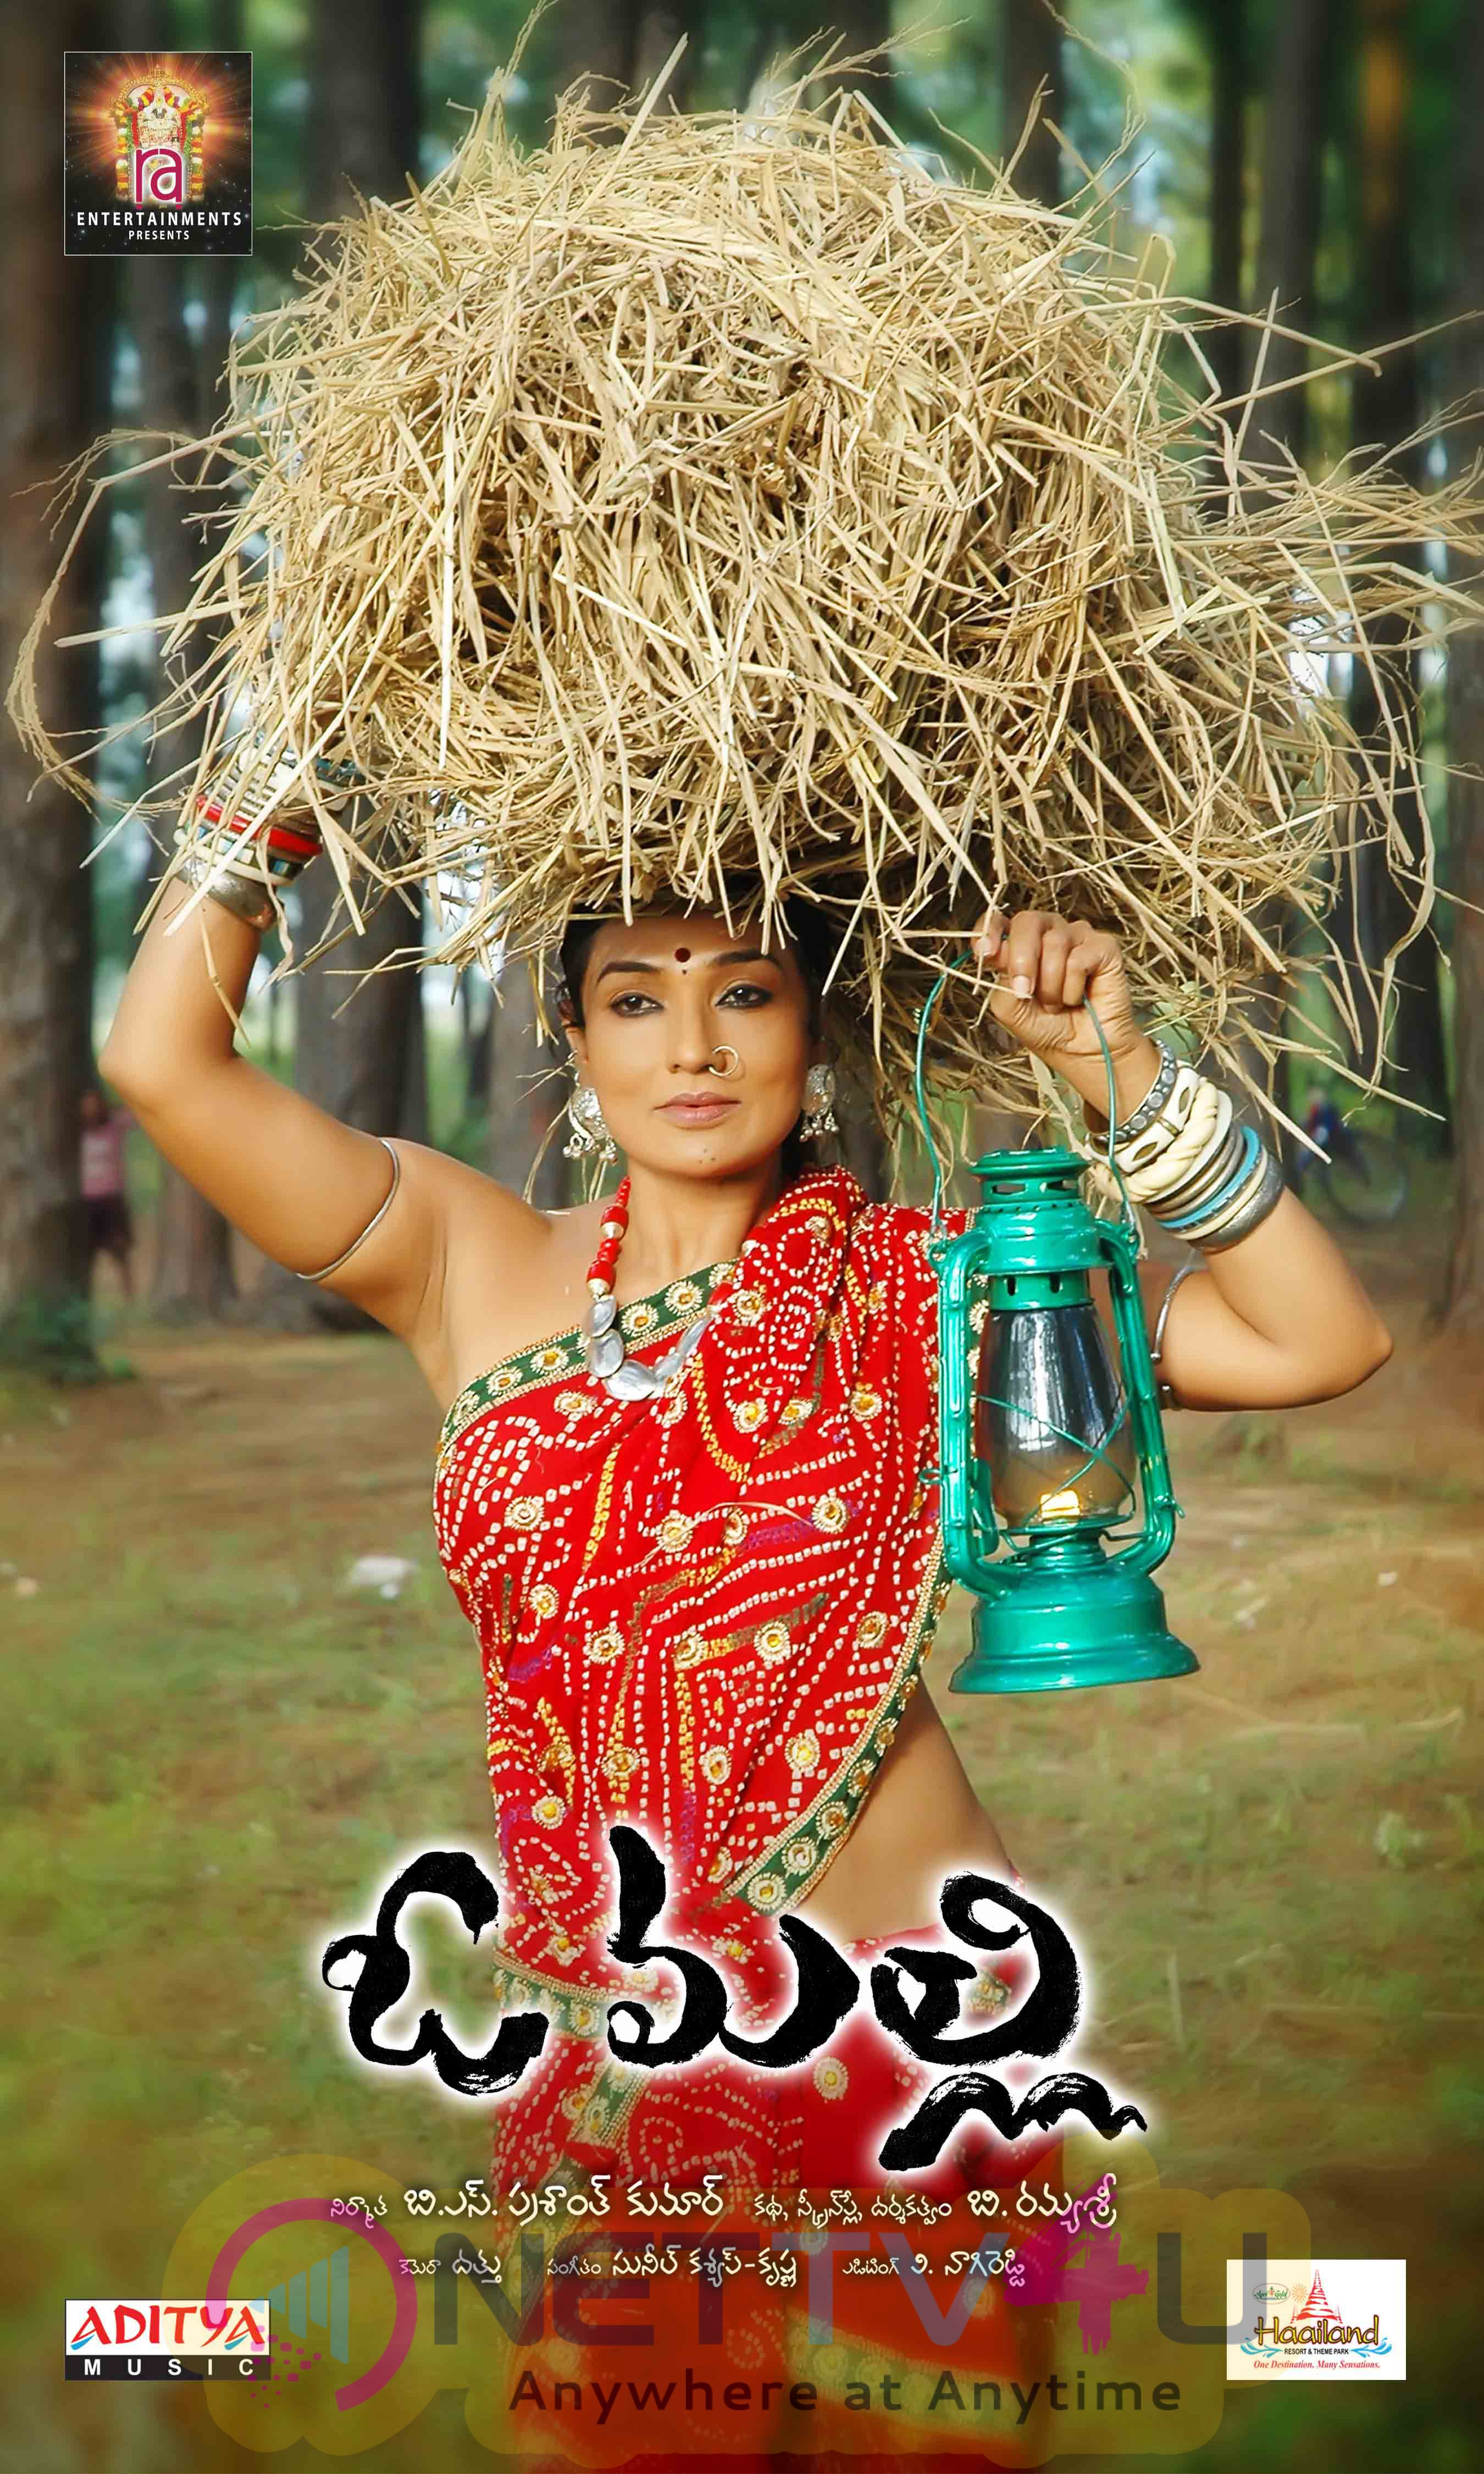 Latest Telugu Movie O Malli Beauteous Wallpapers